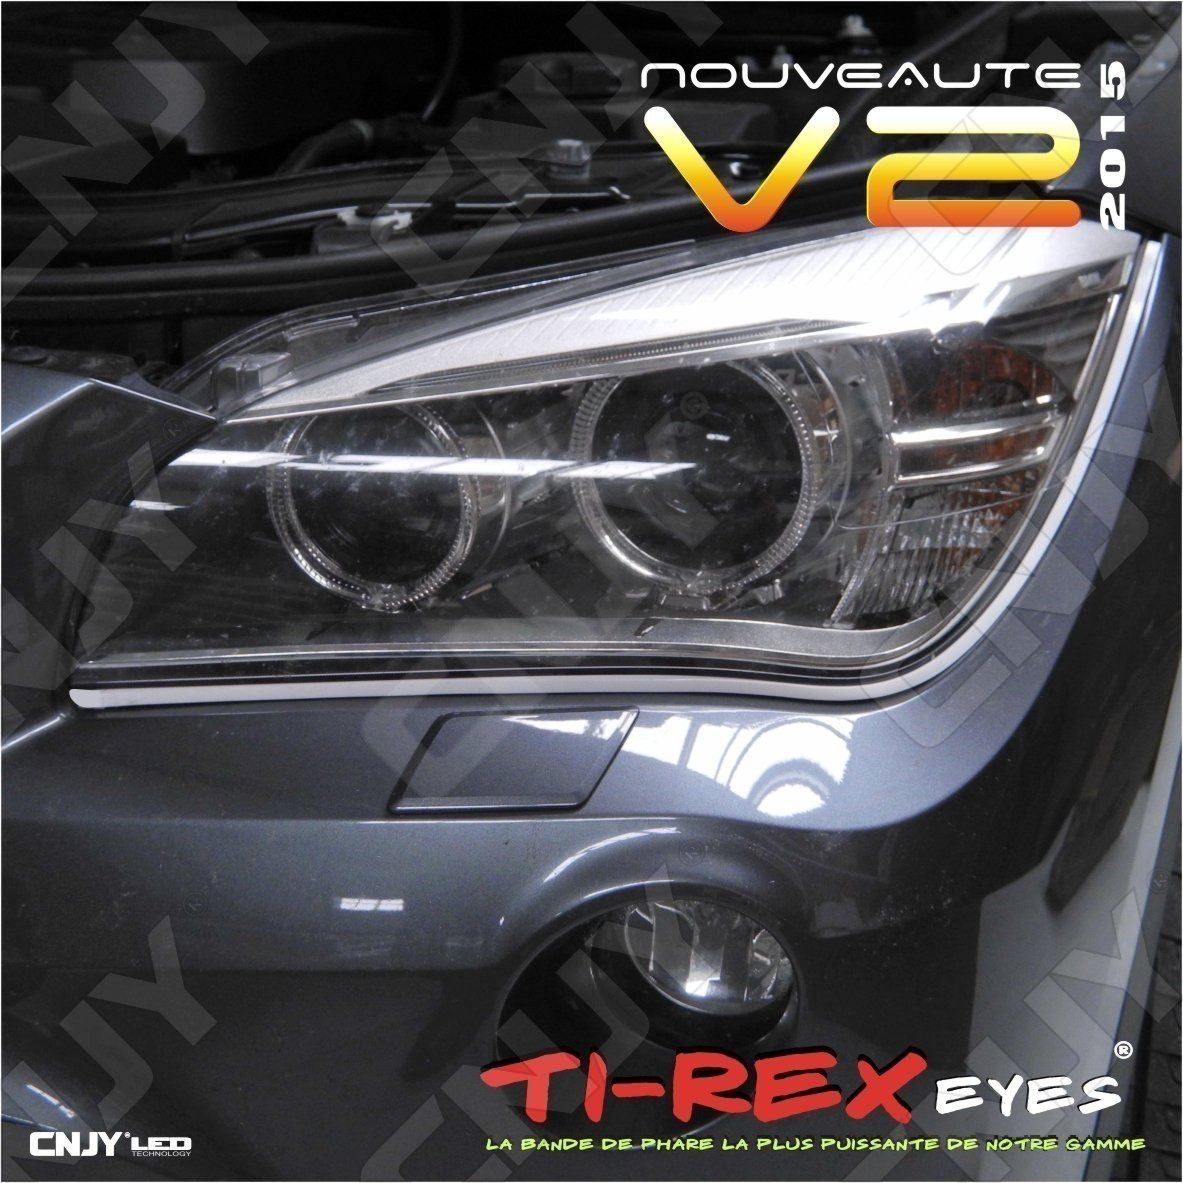 bande,TIREX,TI-REX,V2,led,feux,jour,diurne,phare,drl,souple,module,auto,moto,daylight,12v,diurne,style,audi,a5,5000k